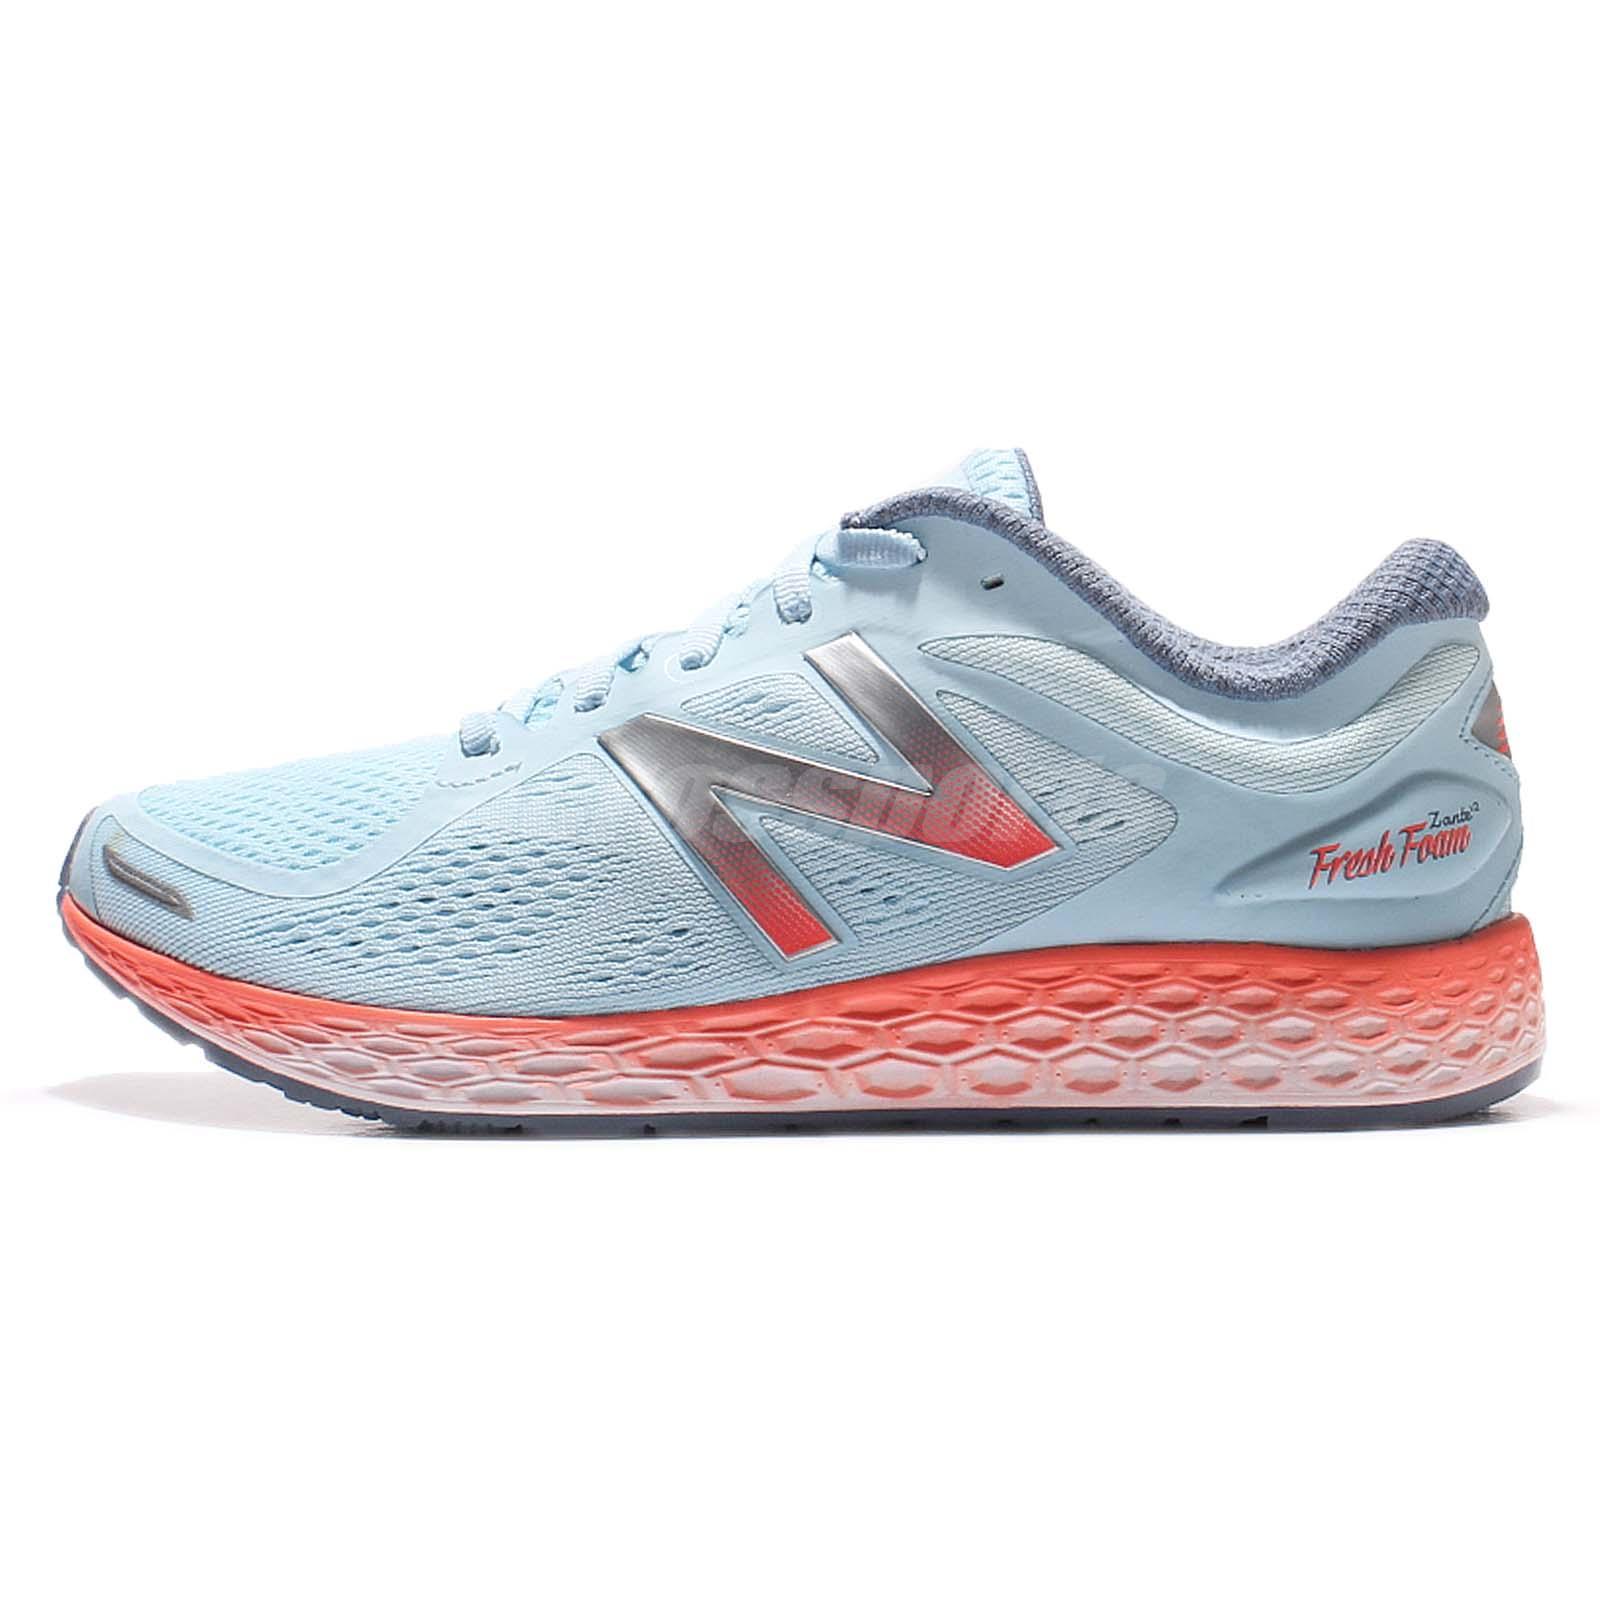 new balance zante womens. new balance wzantba2 d wide zante fresh foam blue orange women running wzantba2d womens